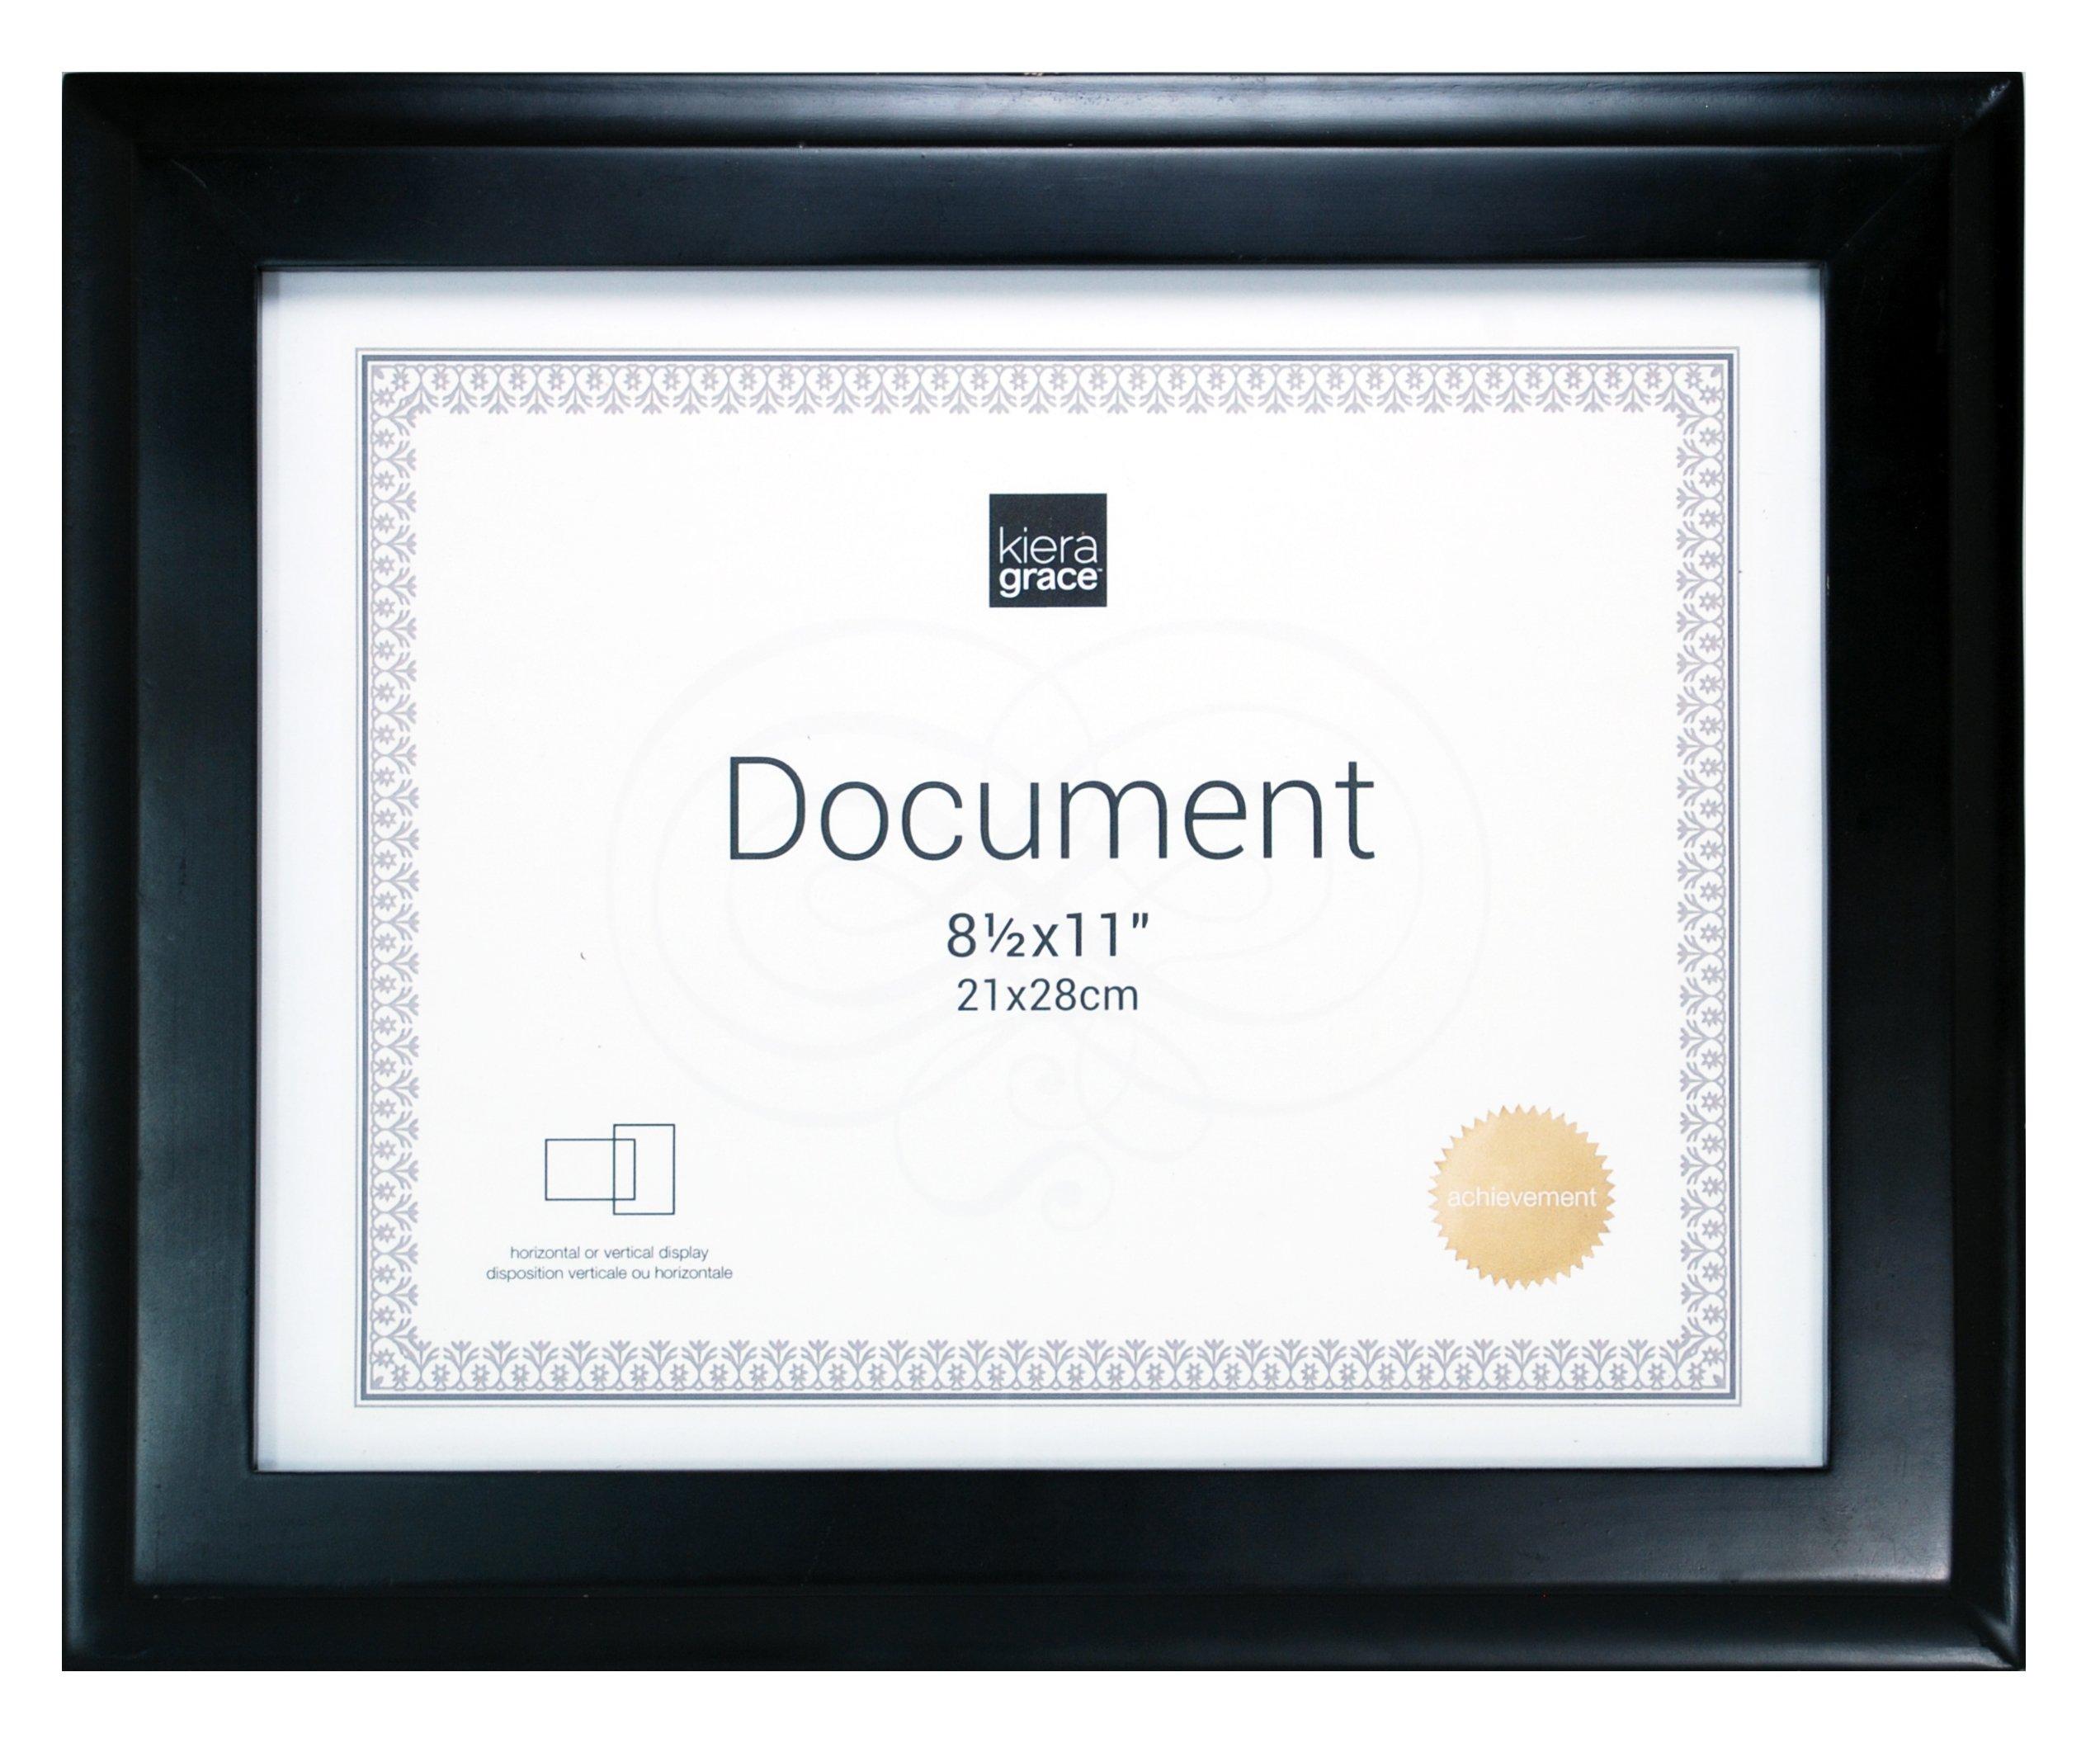 Kiera Grace Oxford Wood Document Frame, 8.5 by 11 Inch - Black